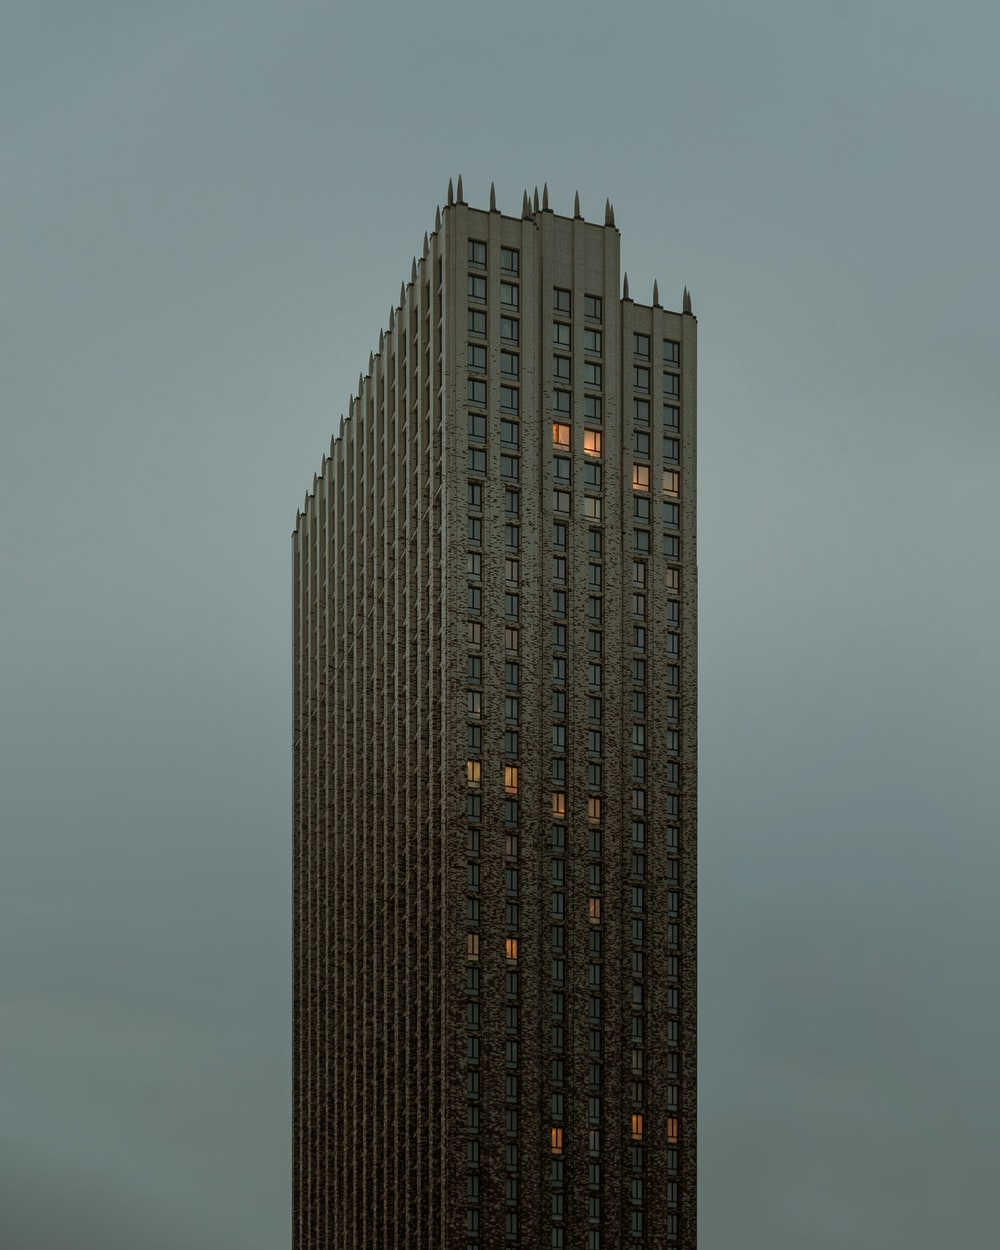 black high rise building under gray sky